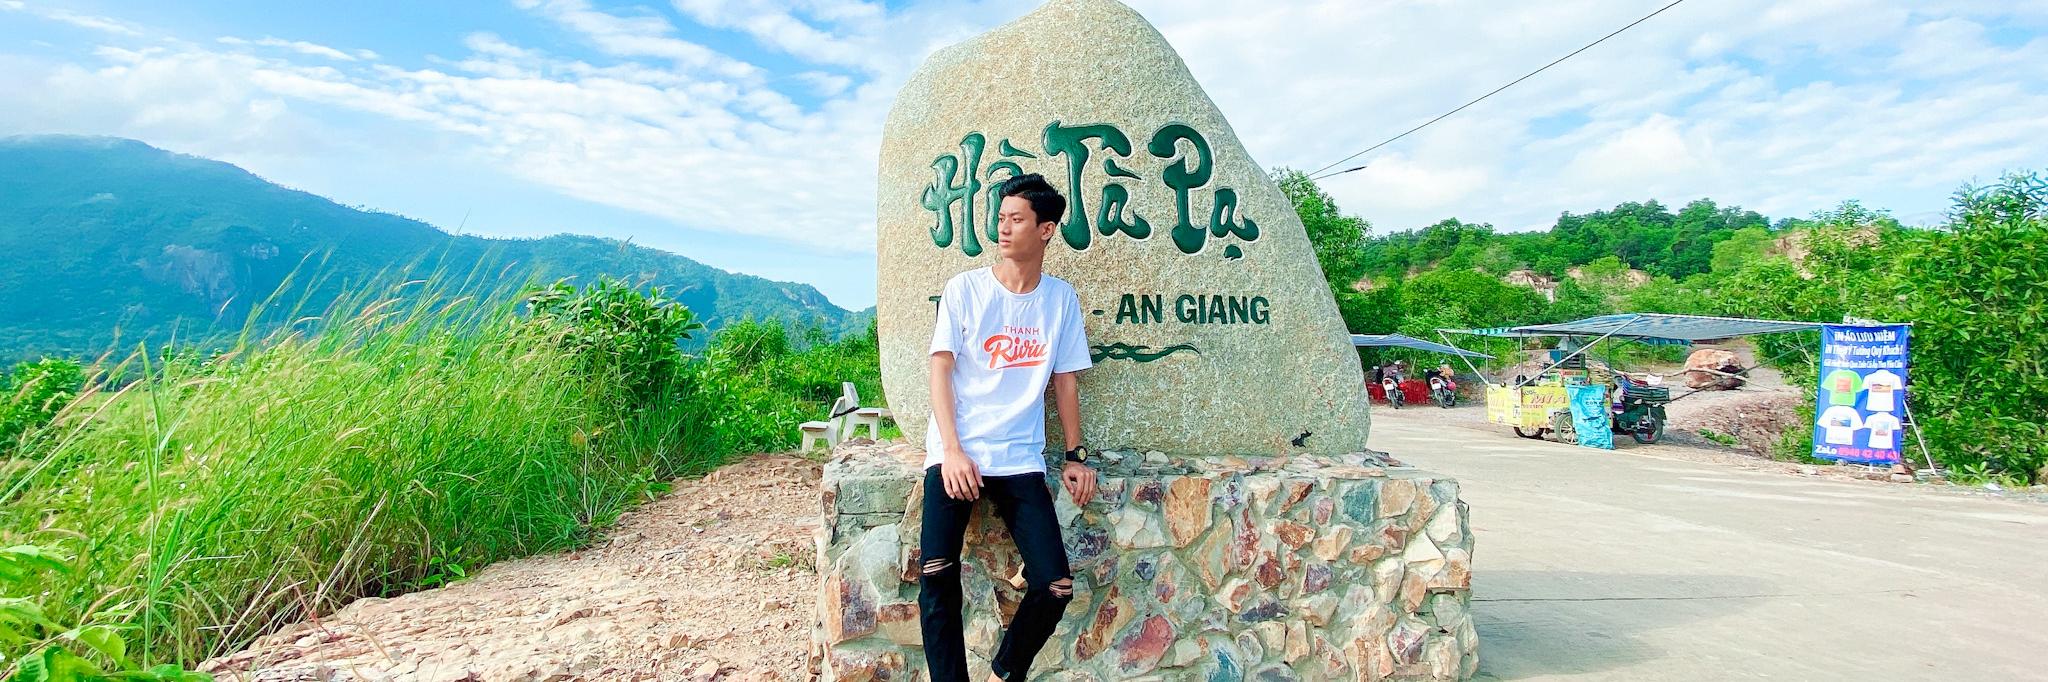 https://gody.vn/blog/kedoan151019983213/post/check-in-goc-nho-ve-dep-moc-mac-cua-vung-dat-tri-ton-an-giang-8242